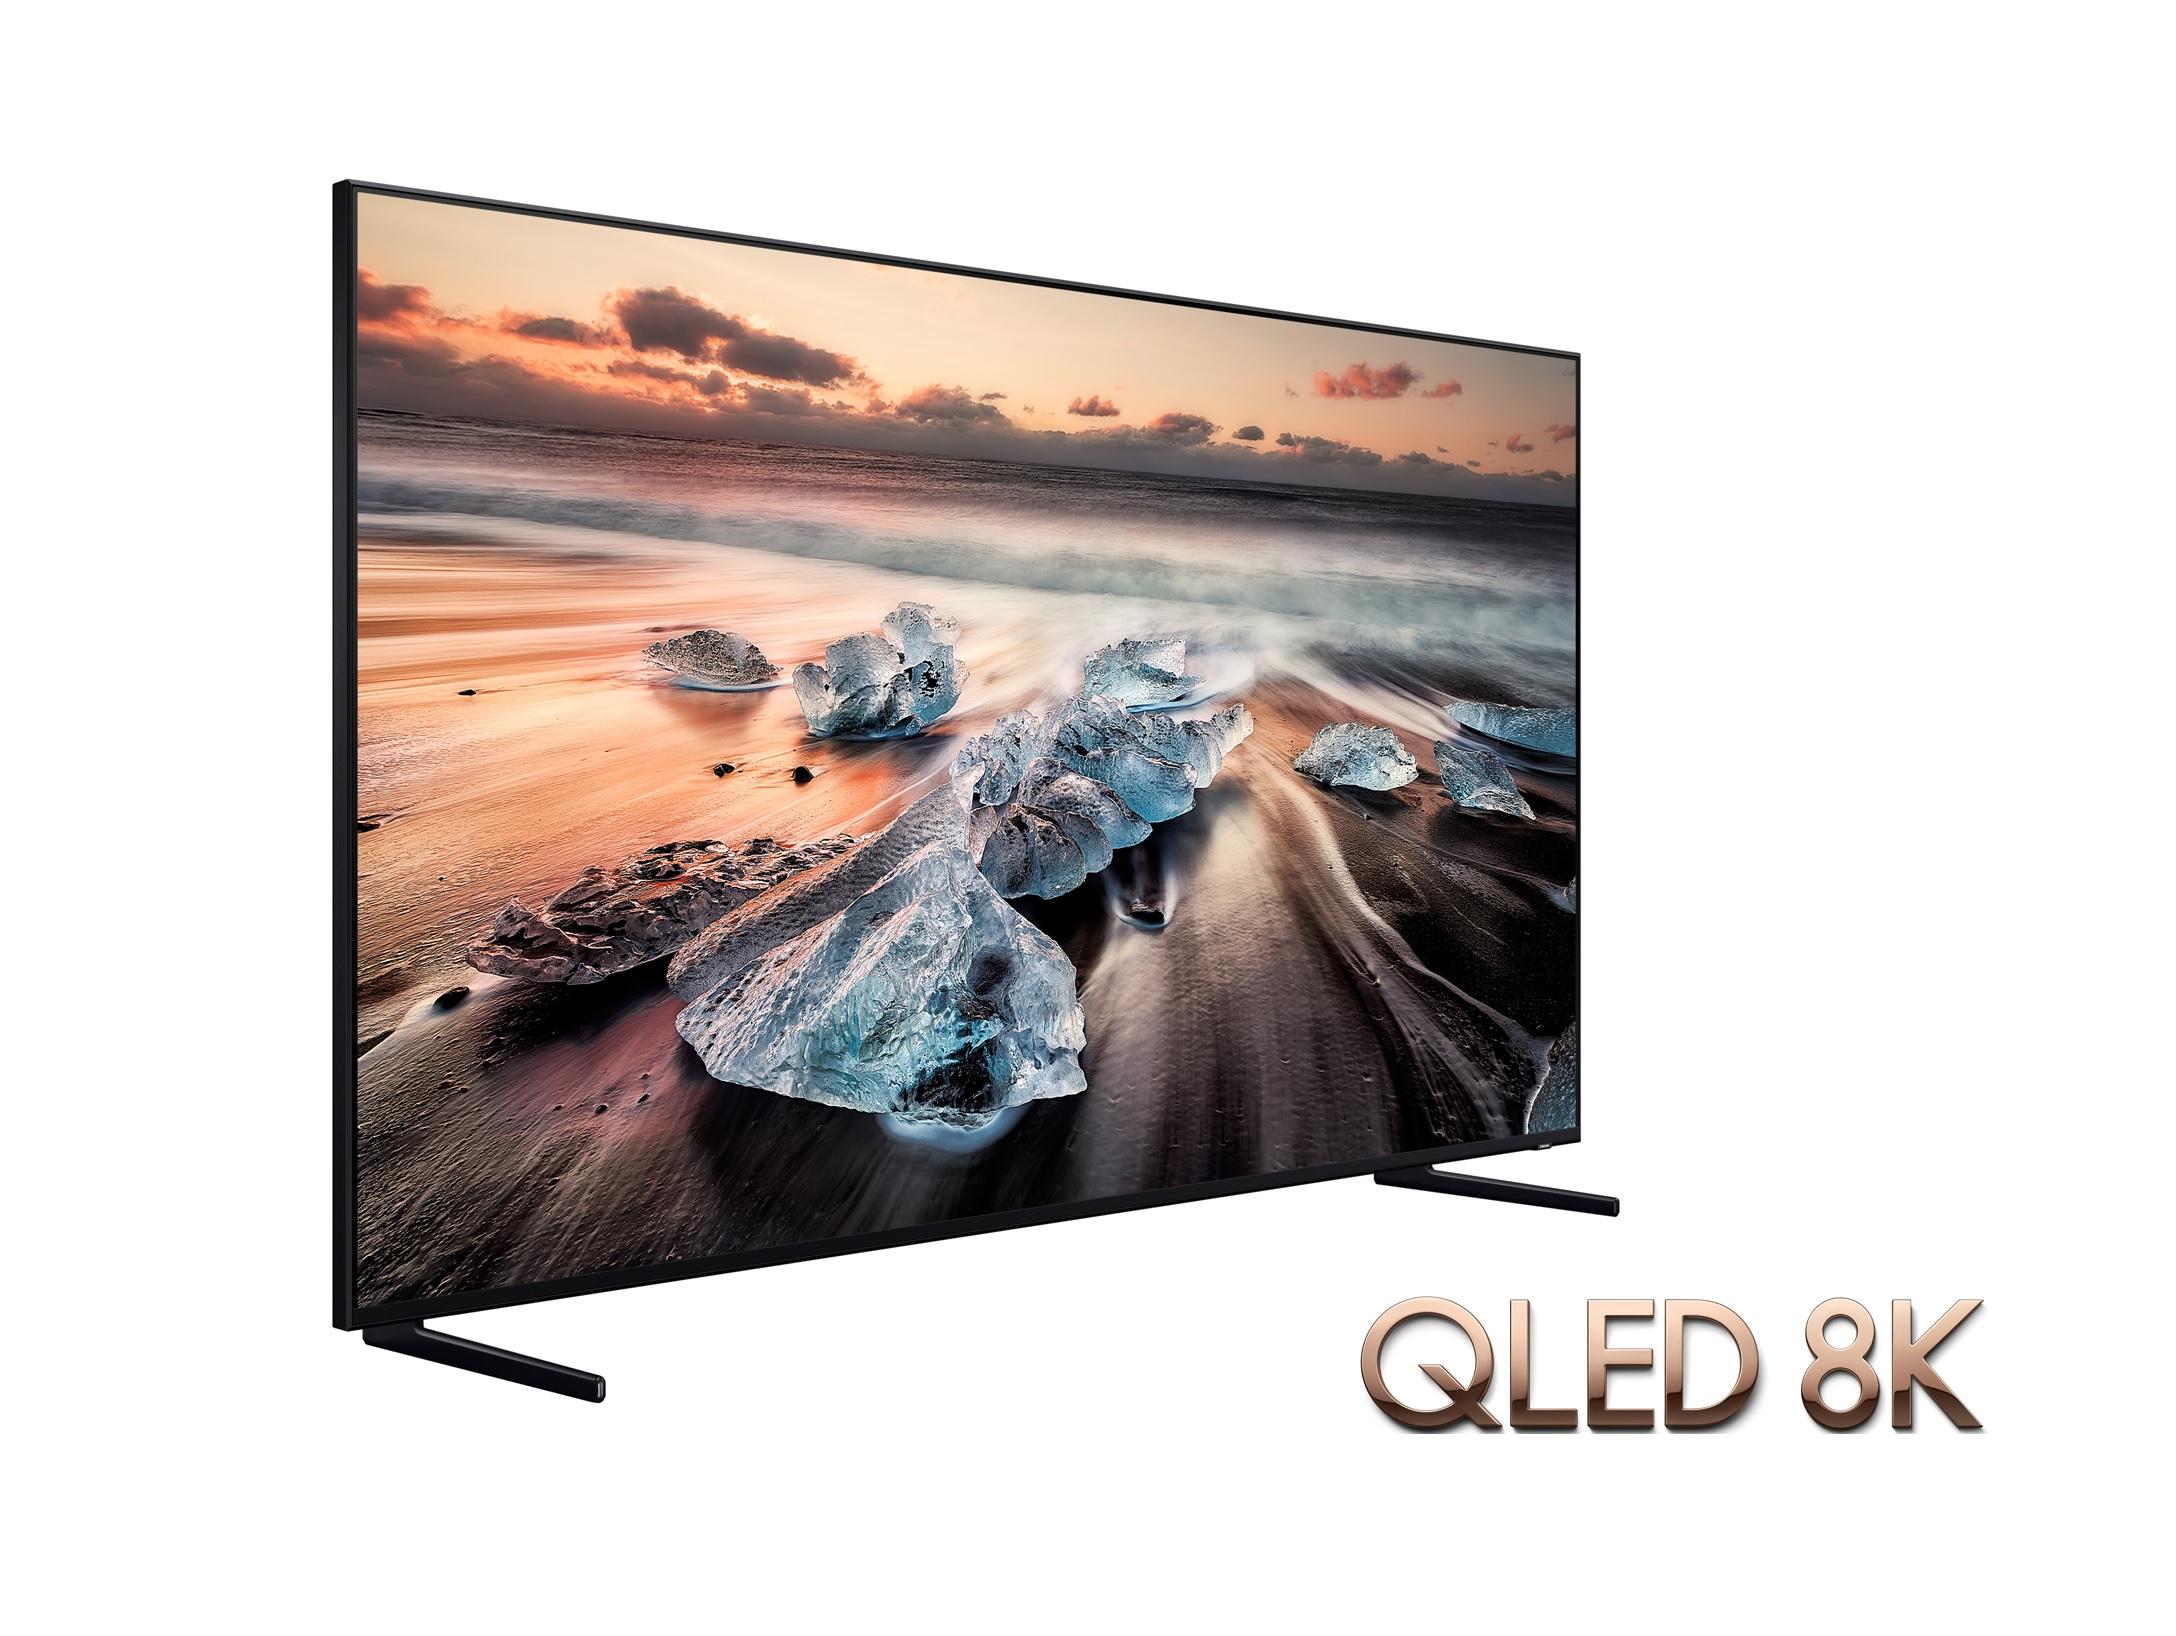 Самсунг иLG представили флагманские 8K-телевизоры